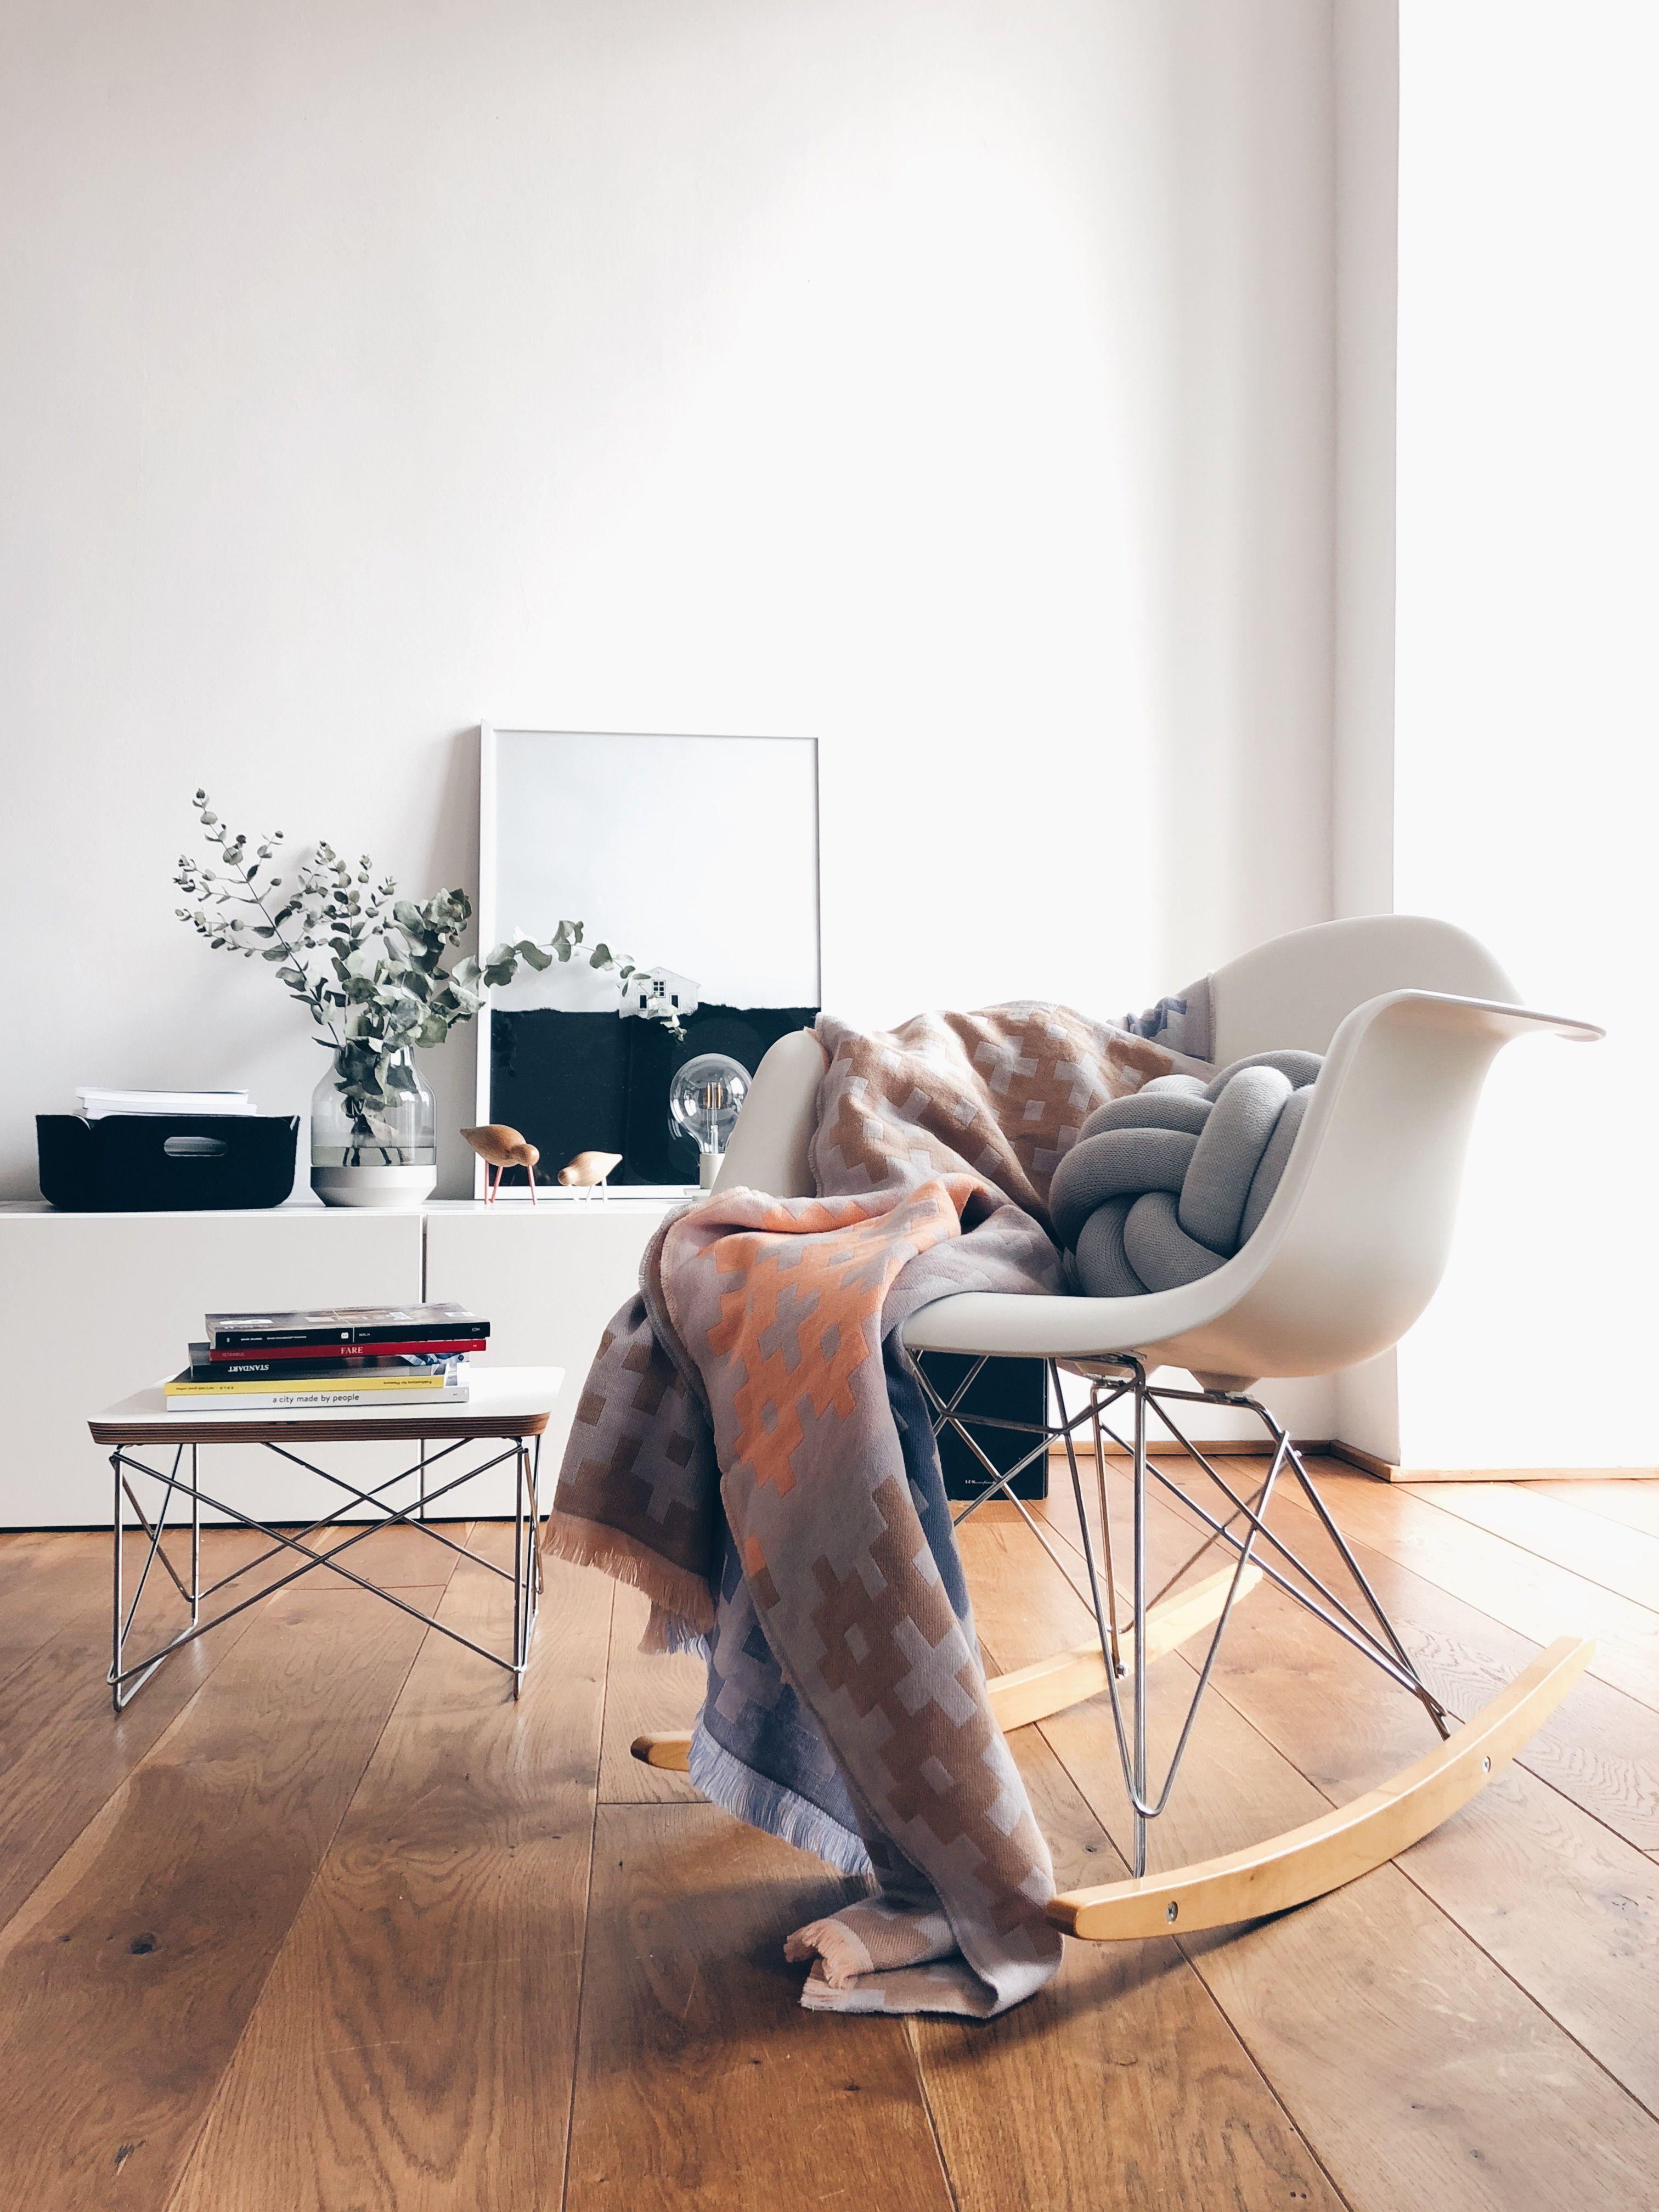 Vitra Eames Plastic Armchair RAR, Ahorn gelblich / Chrom